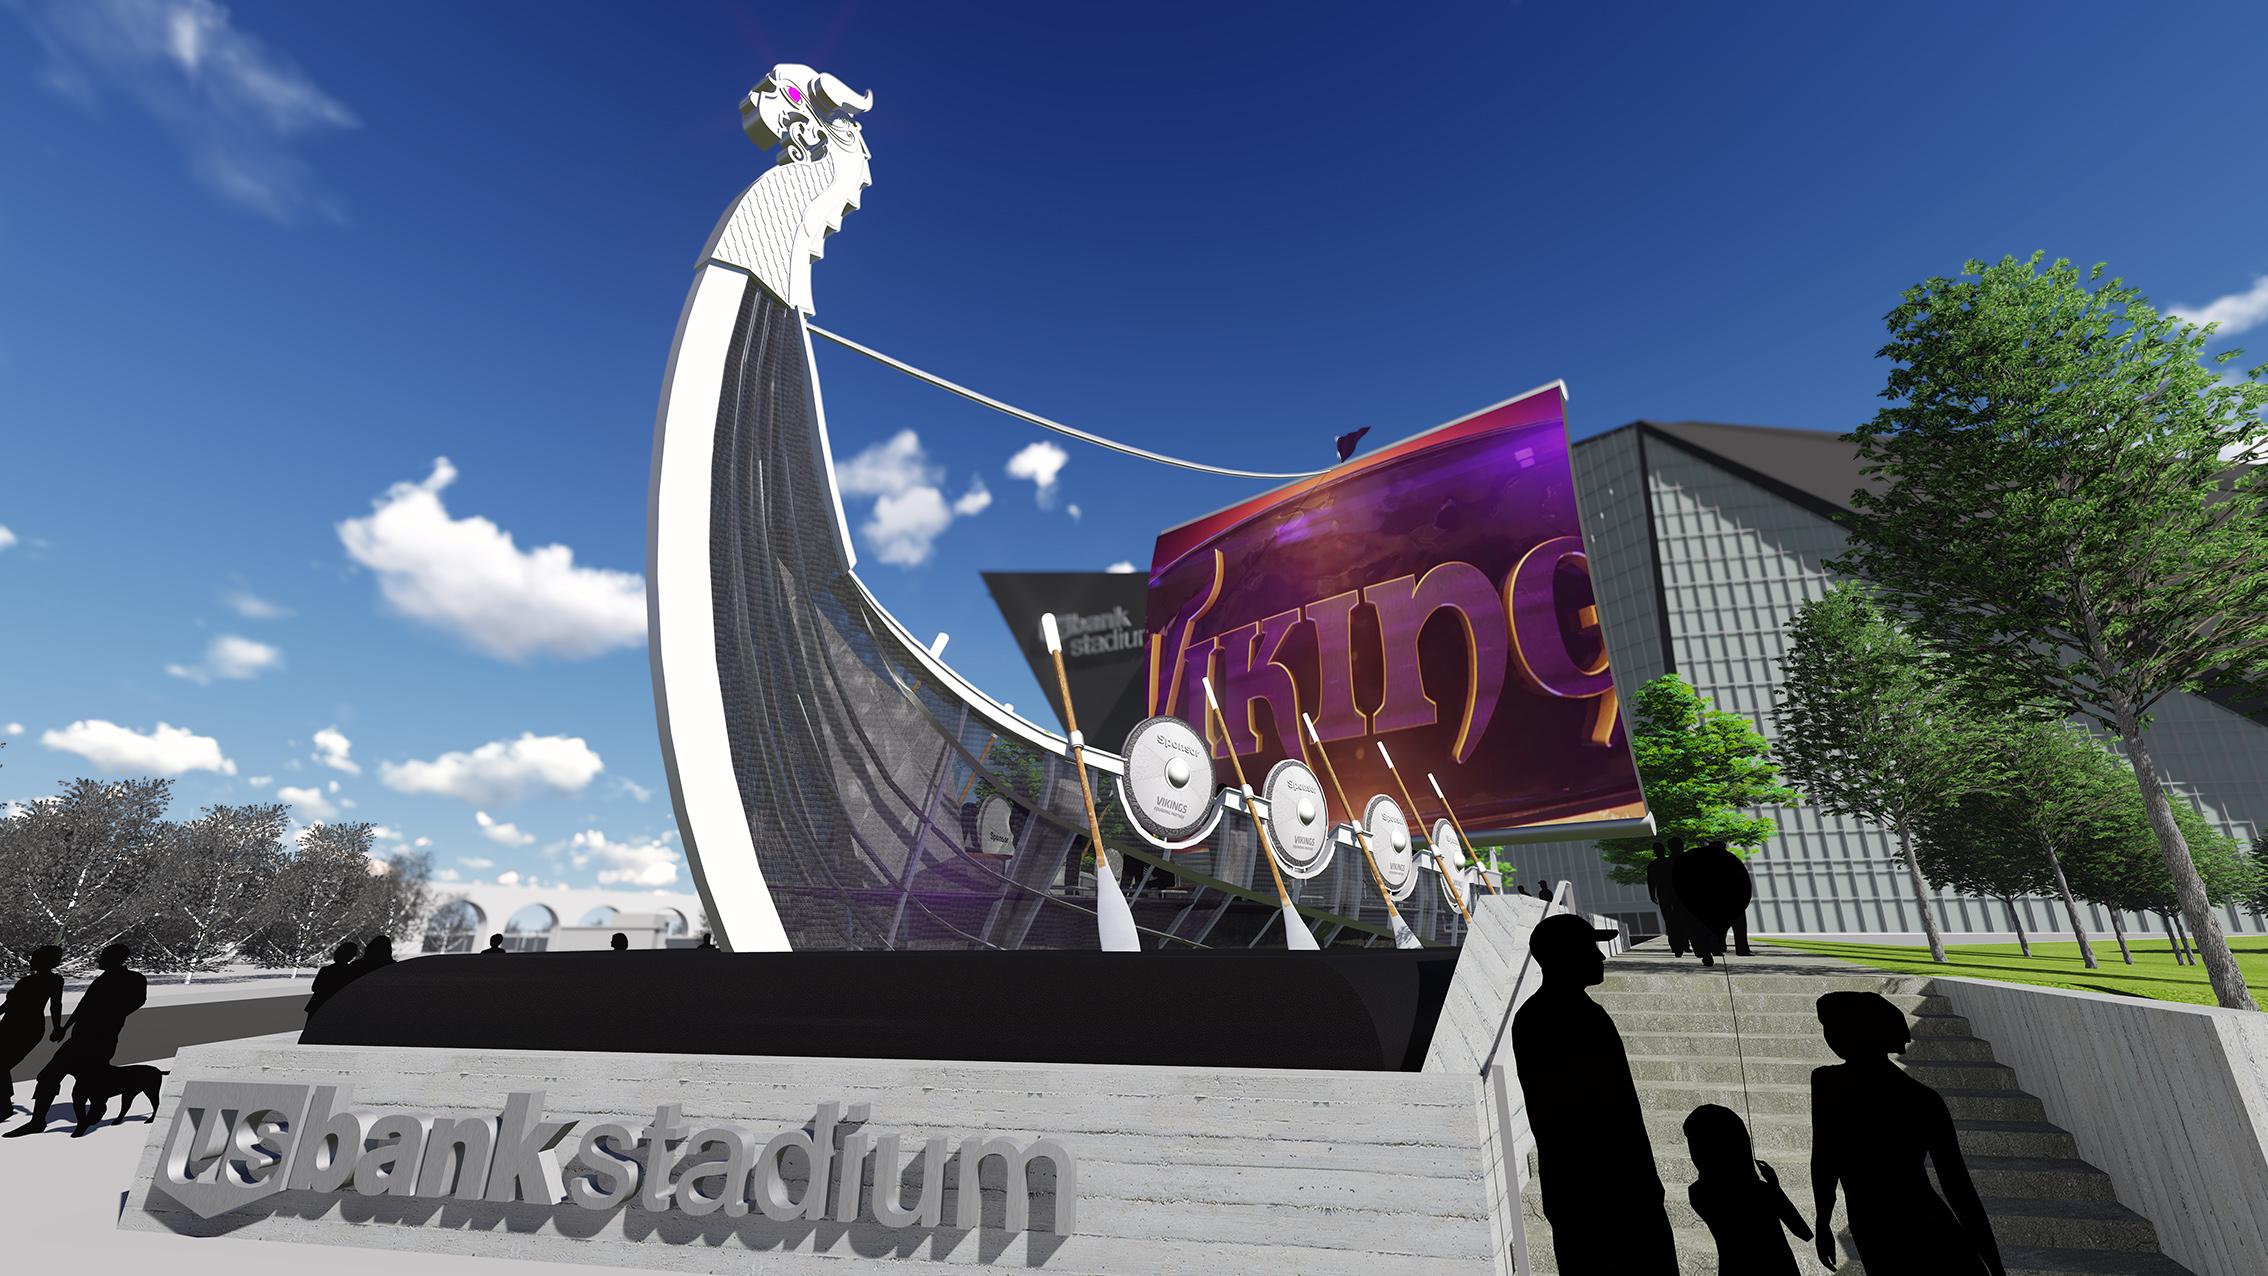 Emerging From The Mist RipBang Designs Foot Viking Ship To - Us bank stadium legacy bricks map